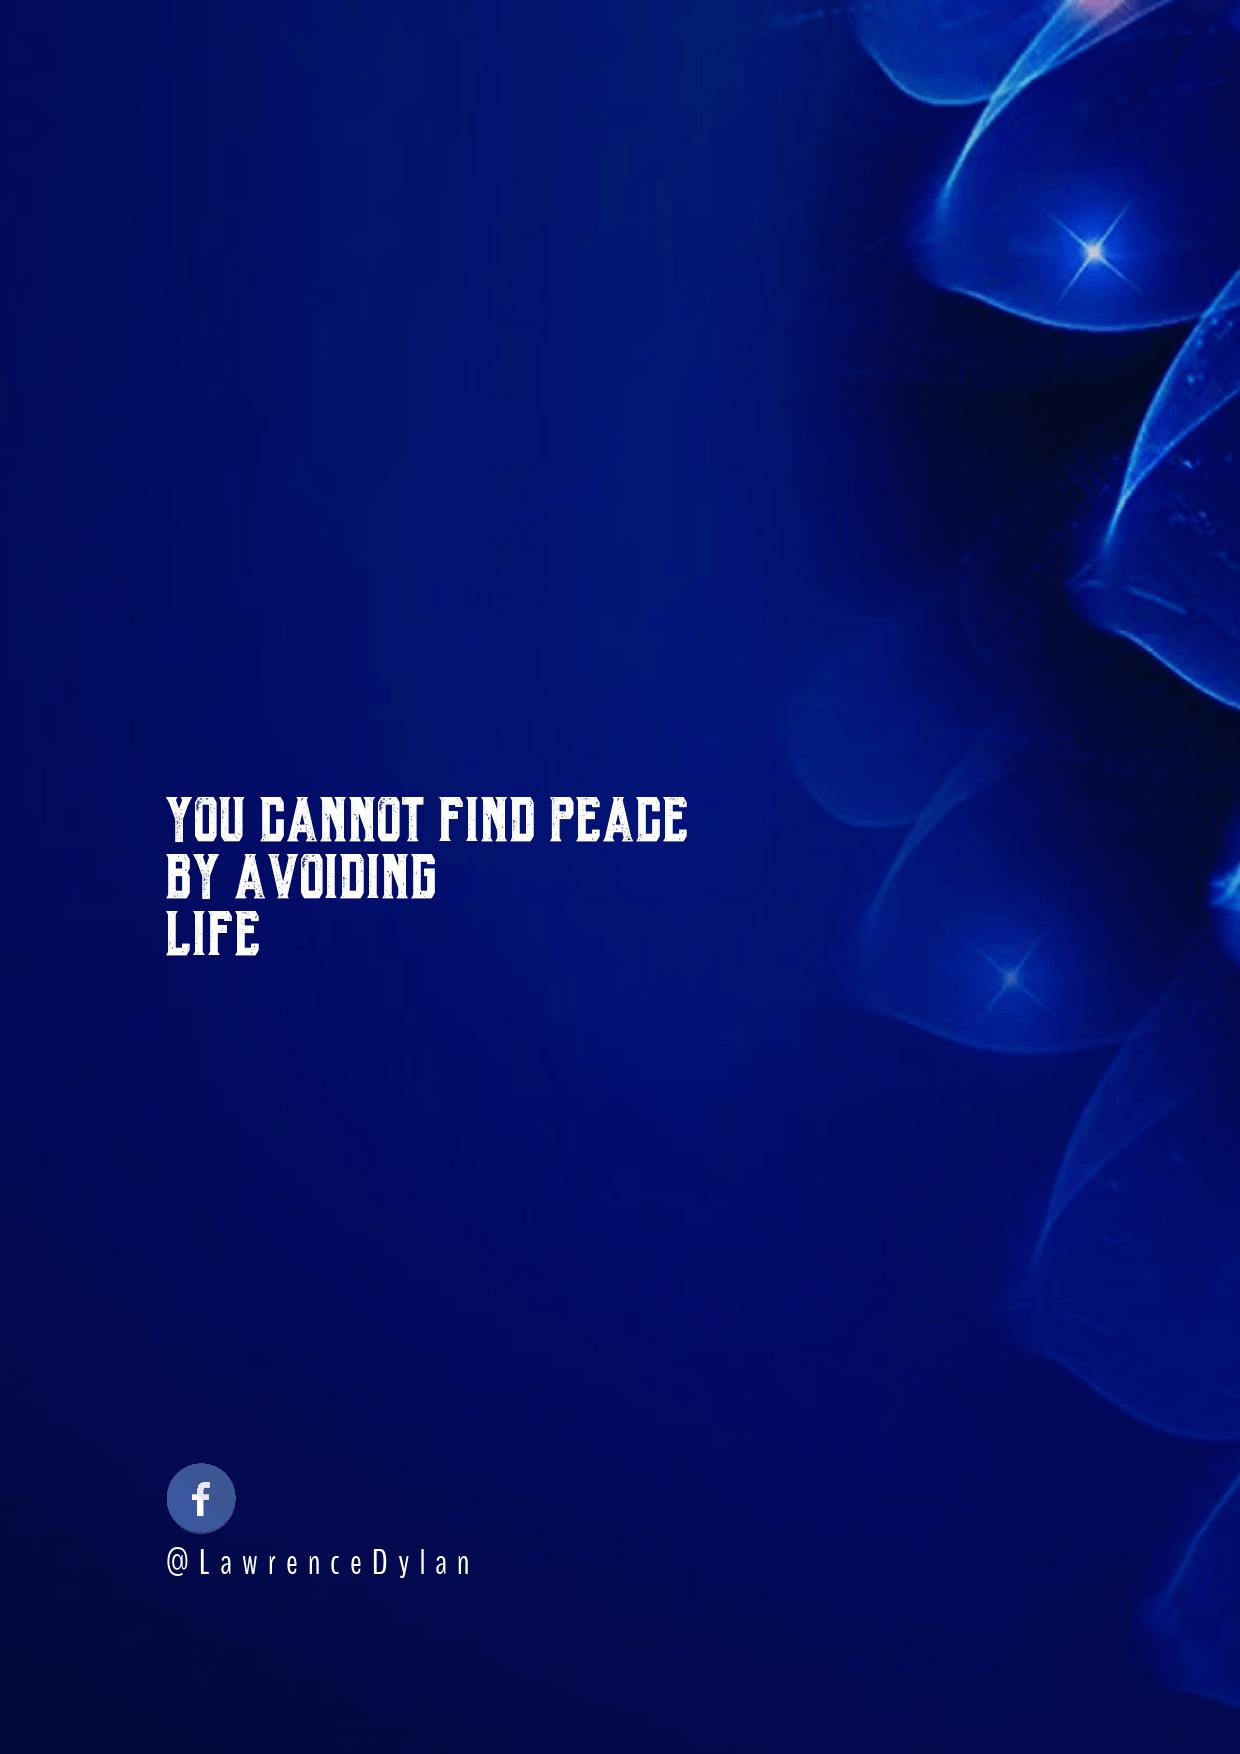 Blue,                Cobalt,                Text,                Azure,                Computer,                Wallpaper,                Font,                Electric,                Graphics,                Petal,                Sky,                Close,                Trademark,                 Free Image